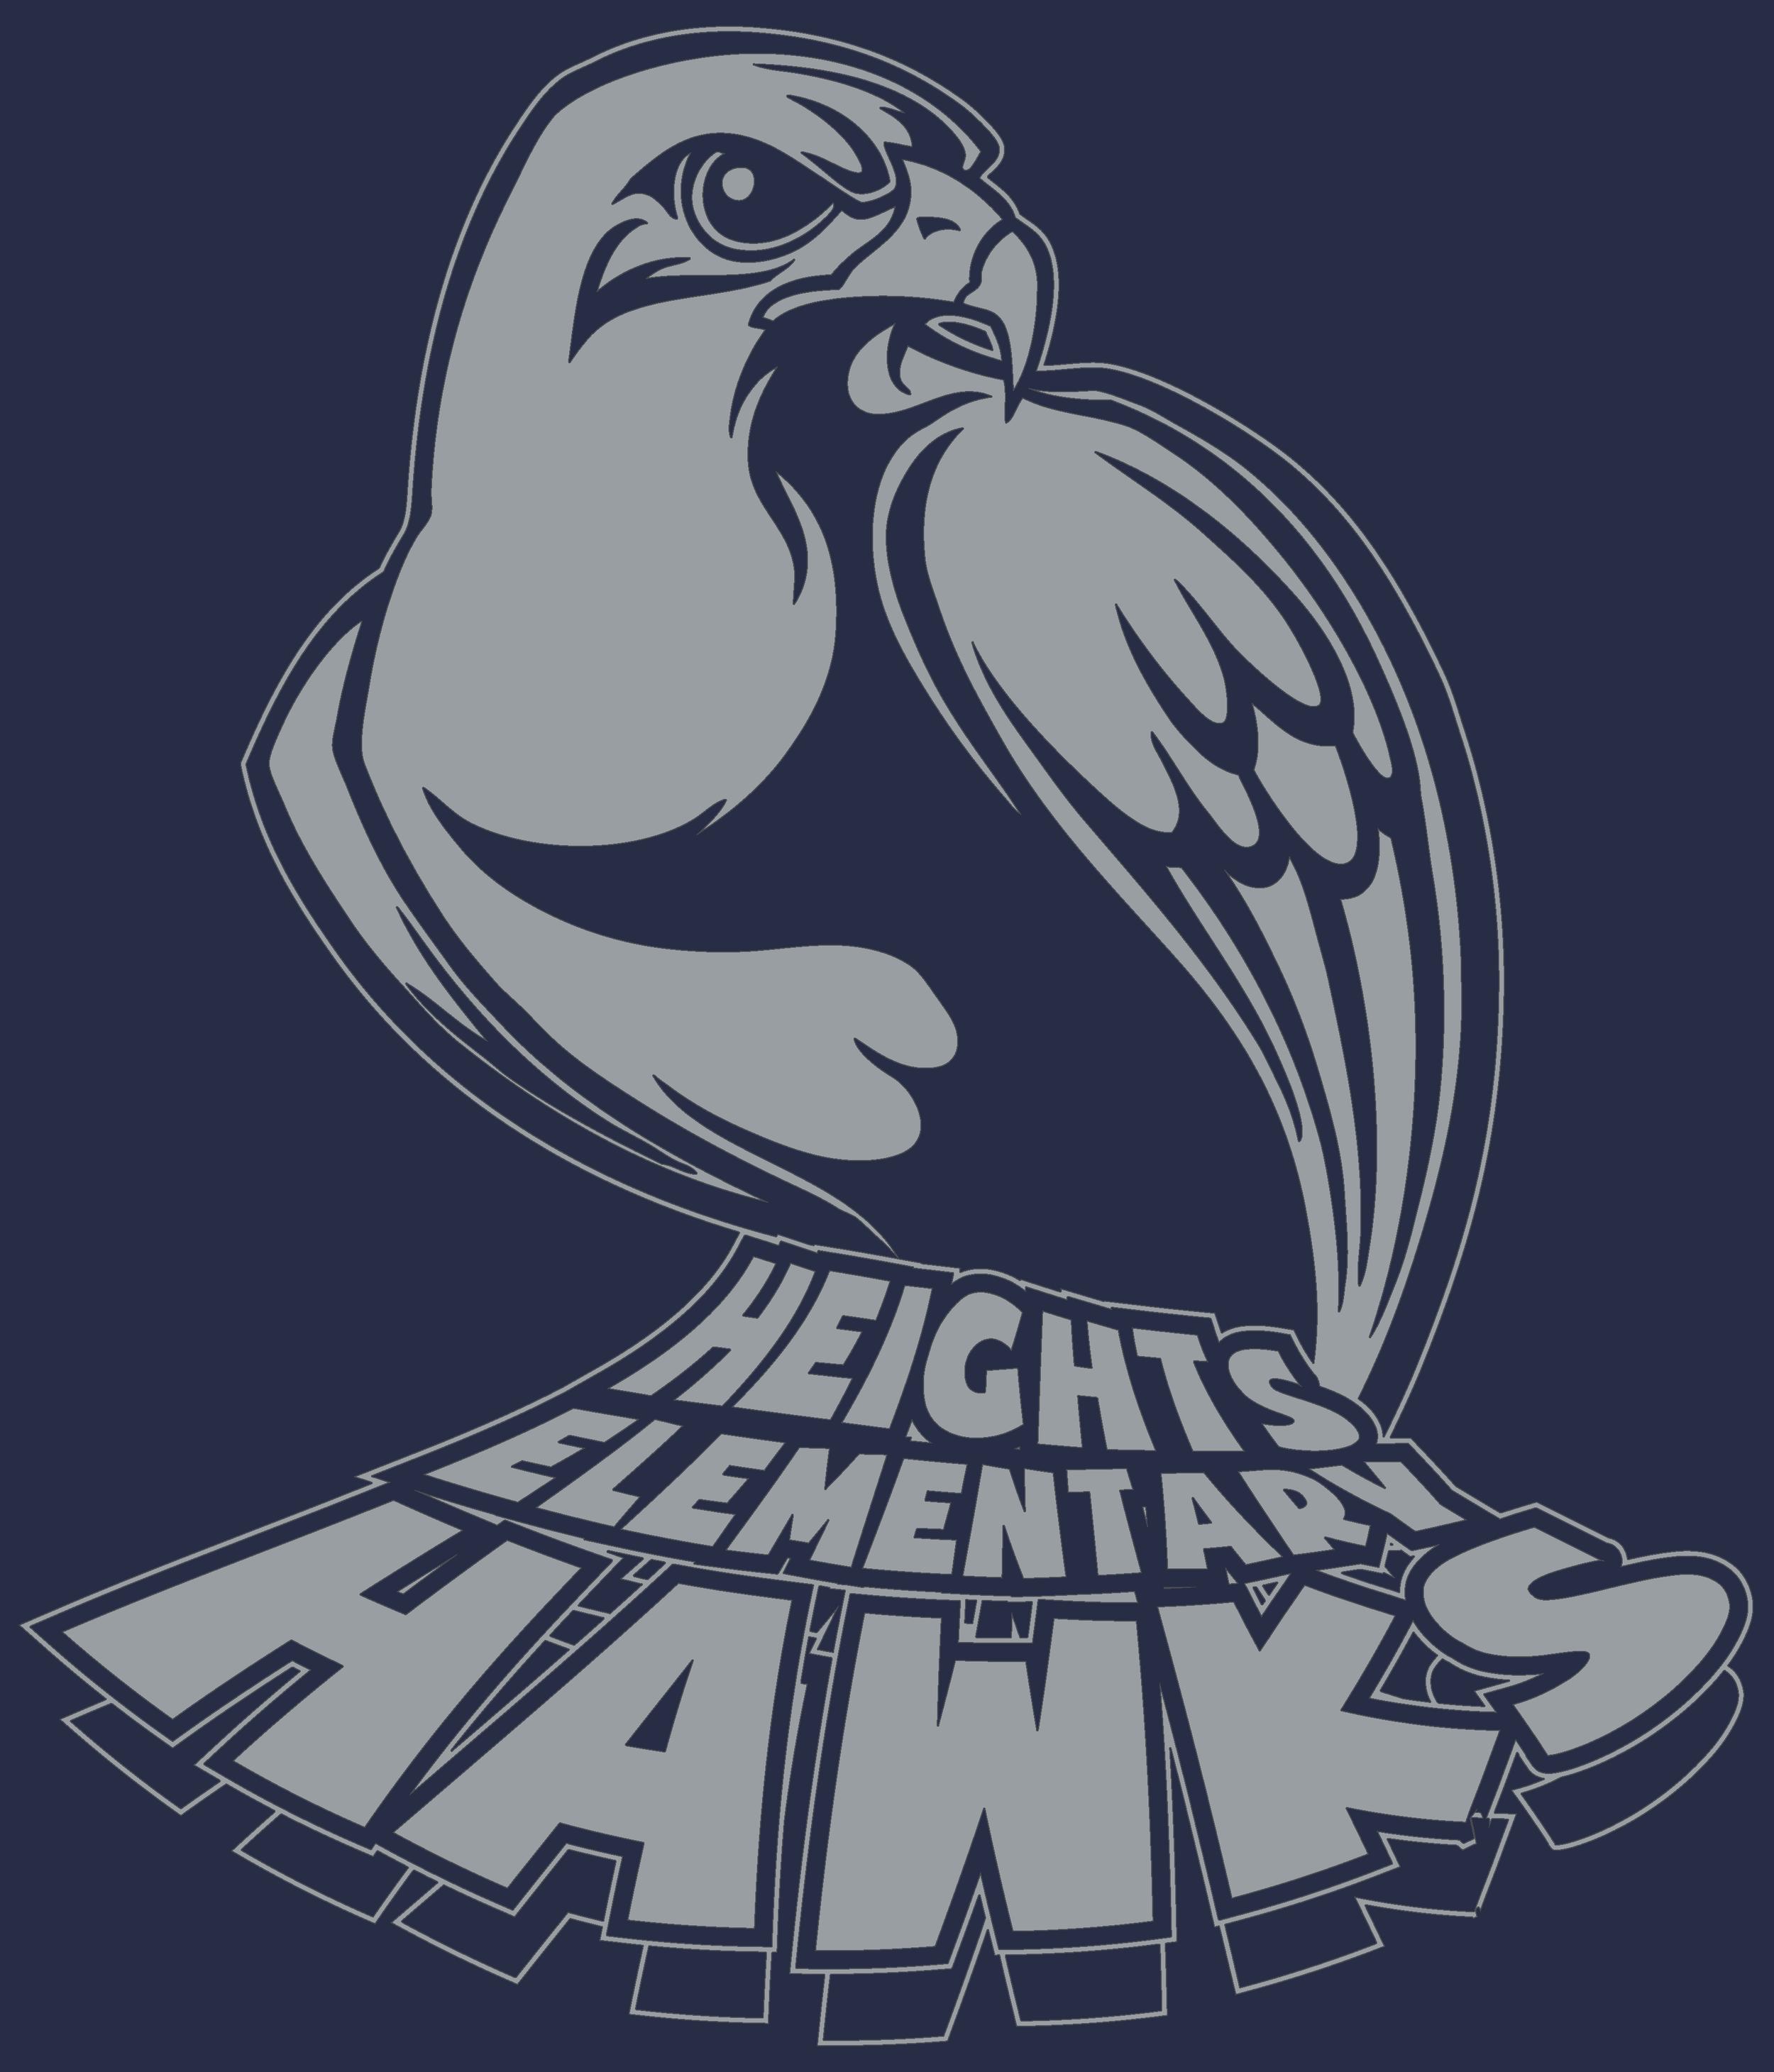 HeightsElementary_2017-11_HeightsElementaryHawks_BACK-SEPSonNavy].png